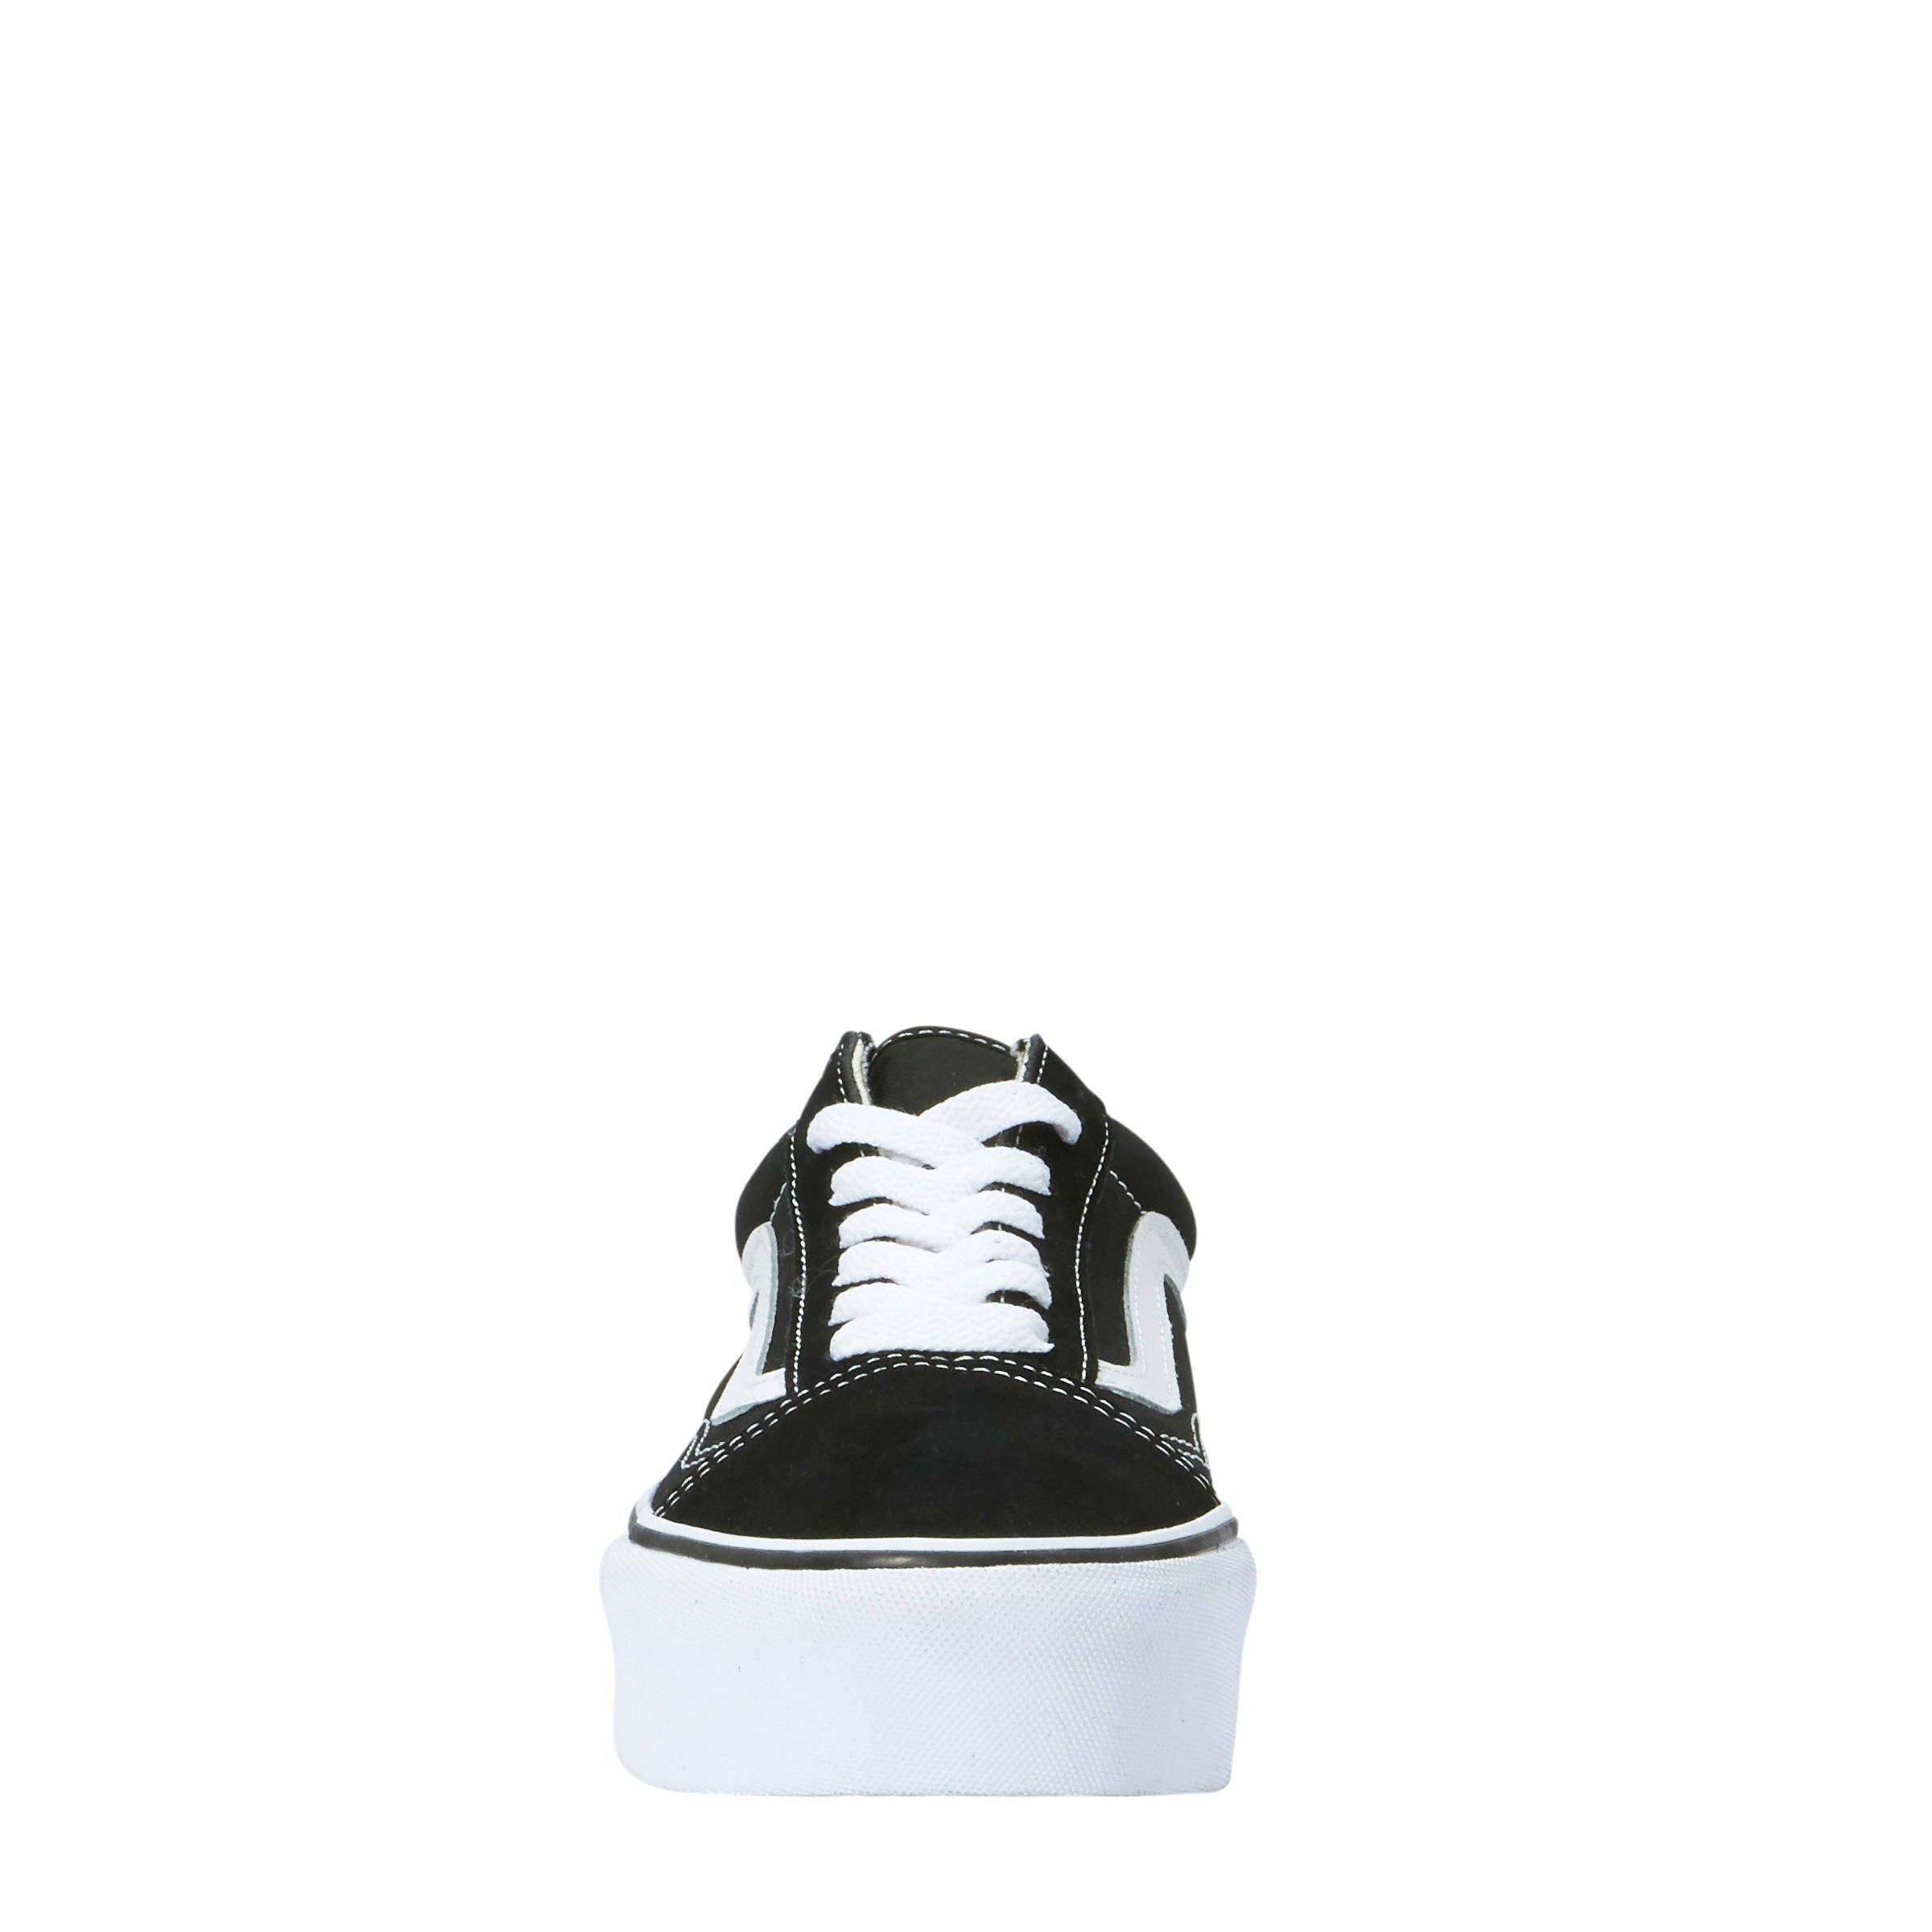 VANS Old Skool Platform sneakers zwart/wit   wehkamp